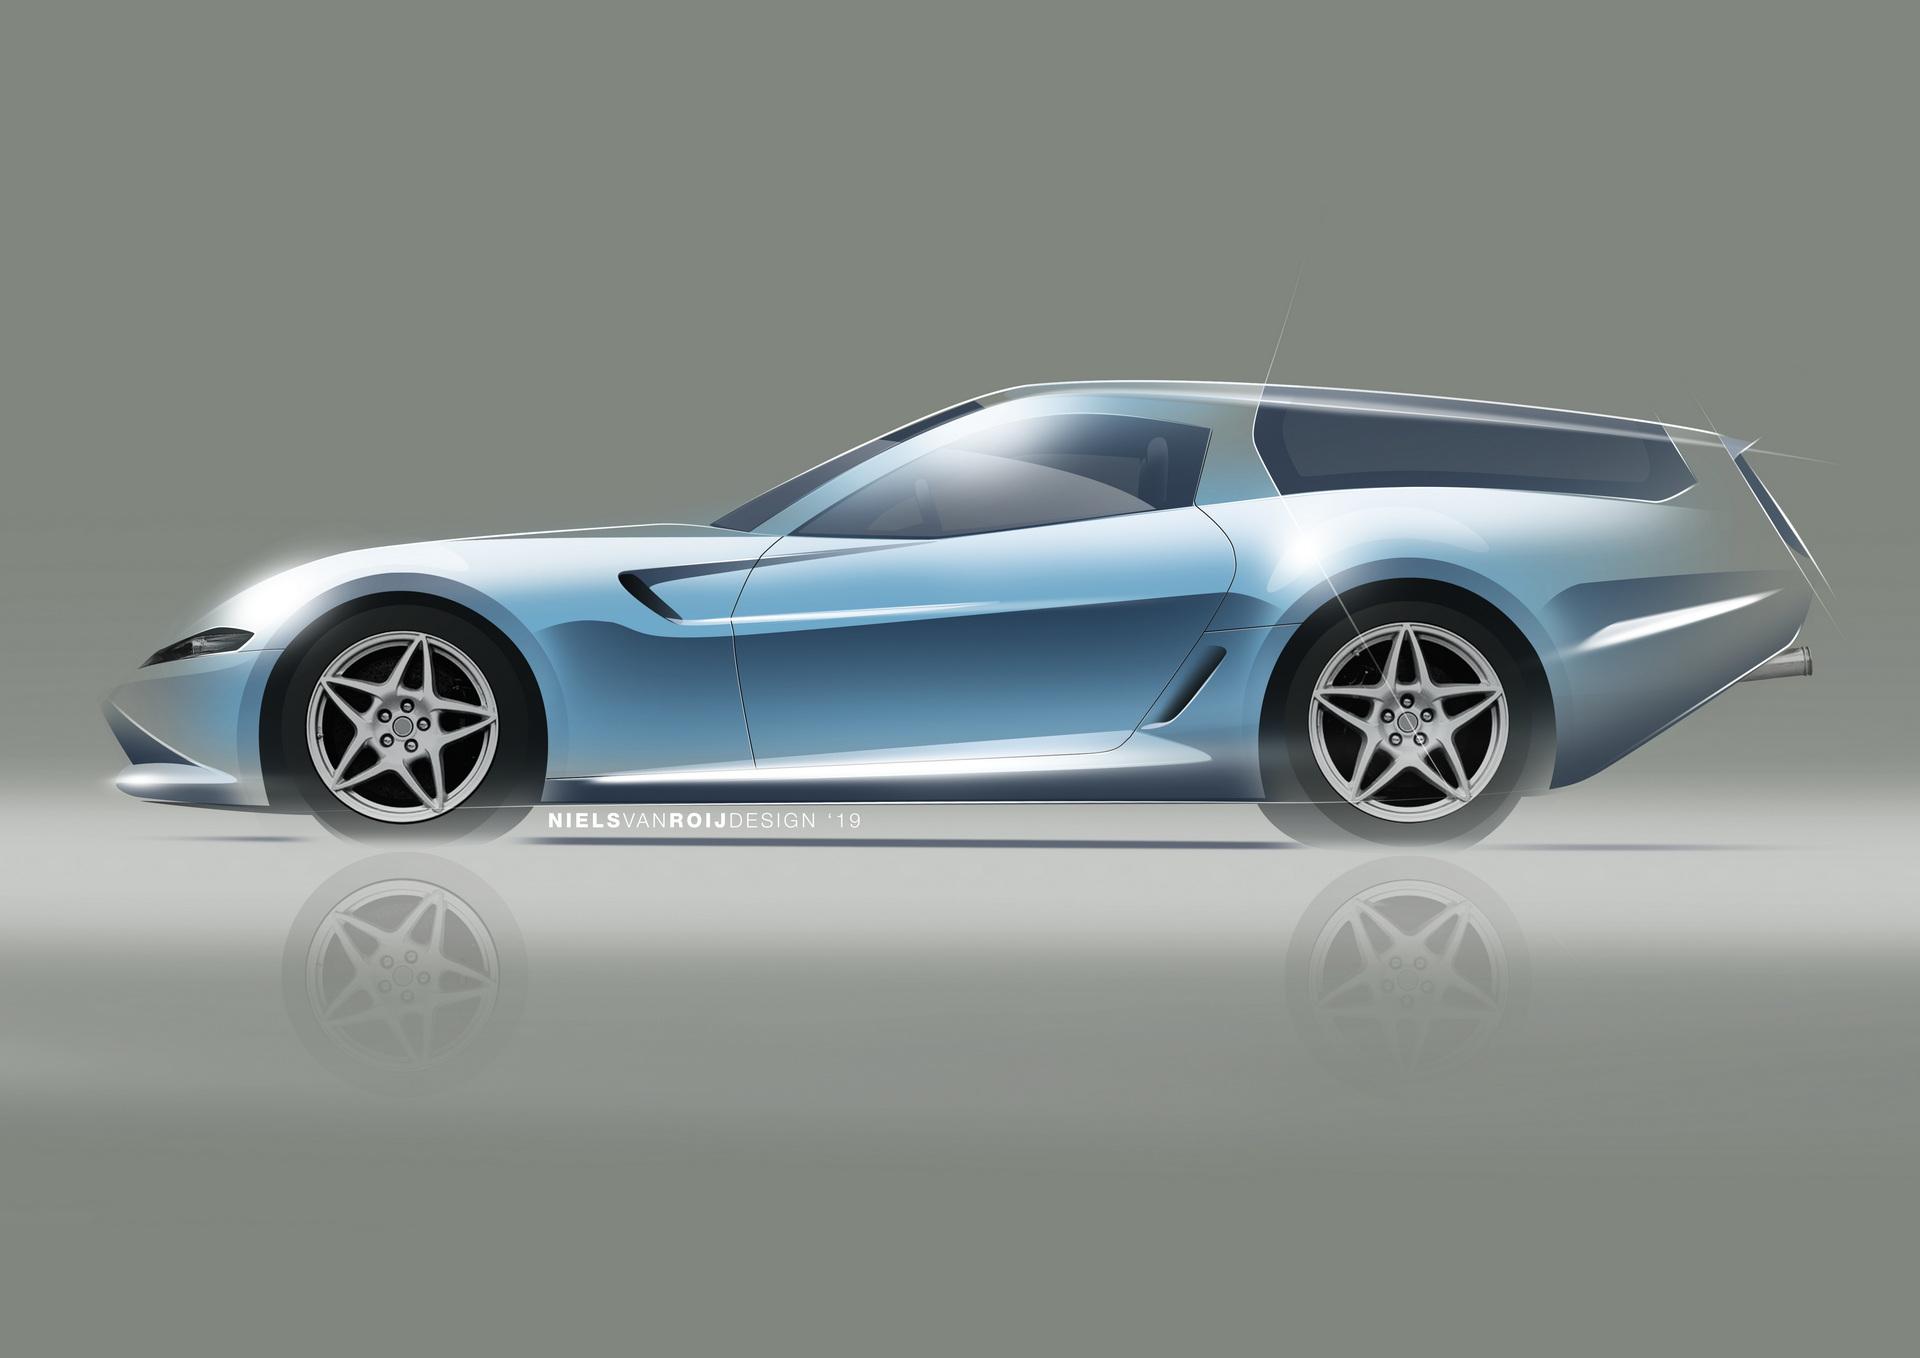 Ferrari-Daytona-Shooting-Brake-Hommage-by-Niels-van-Roij-Design-12